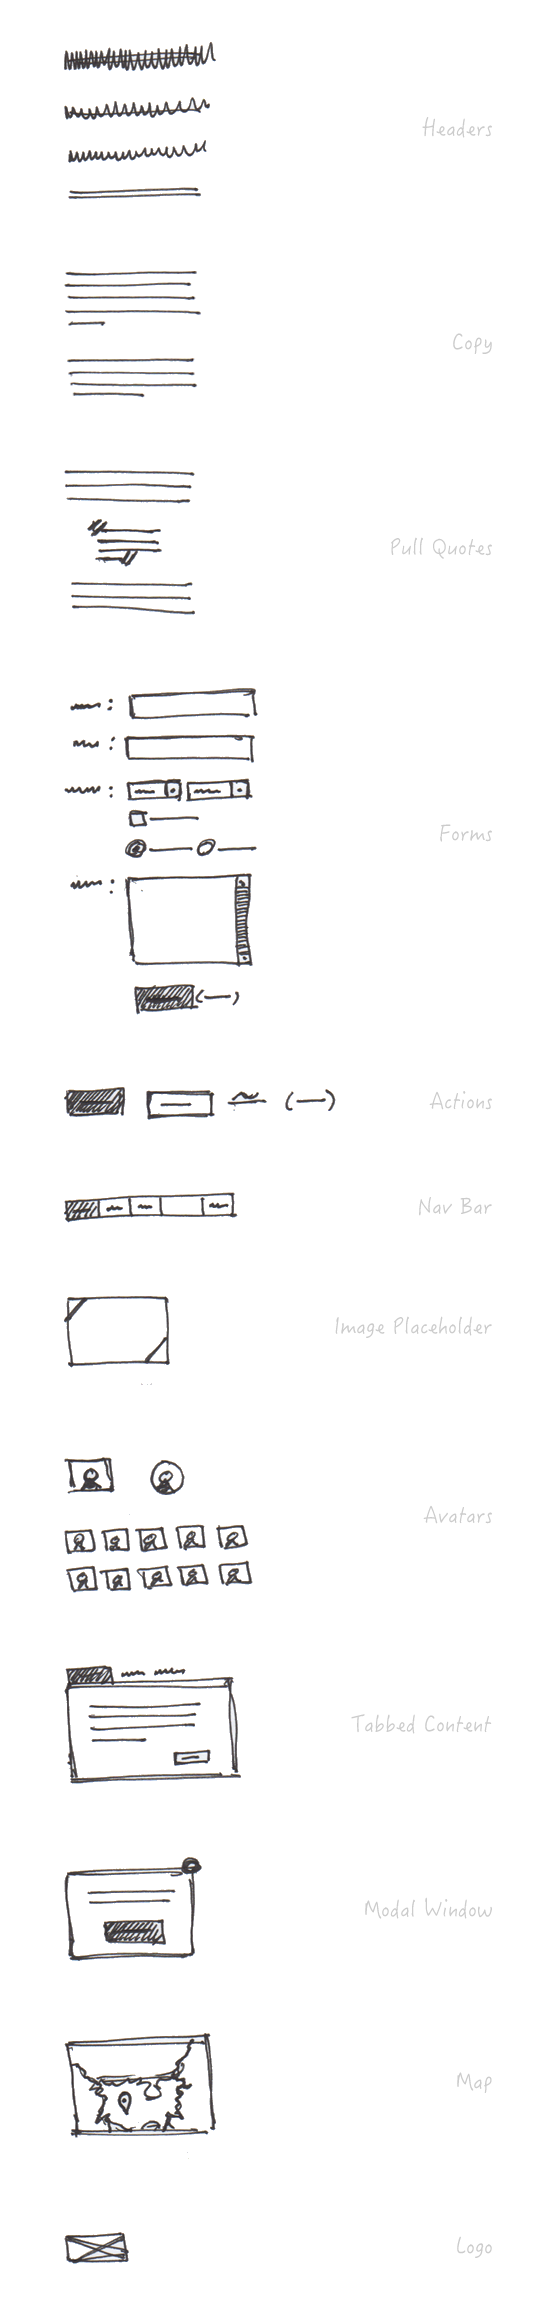 Sketching widgets in a prototype.